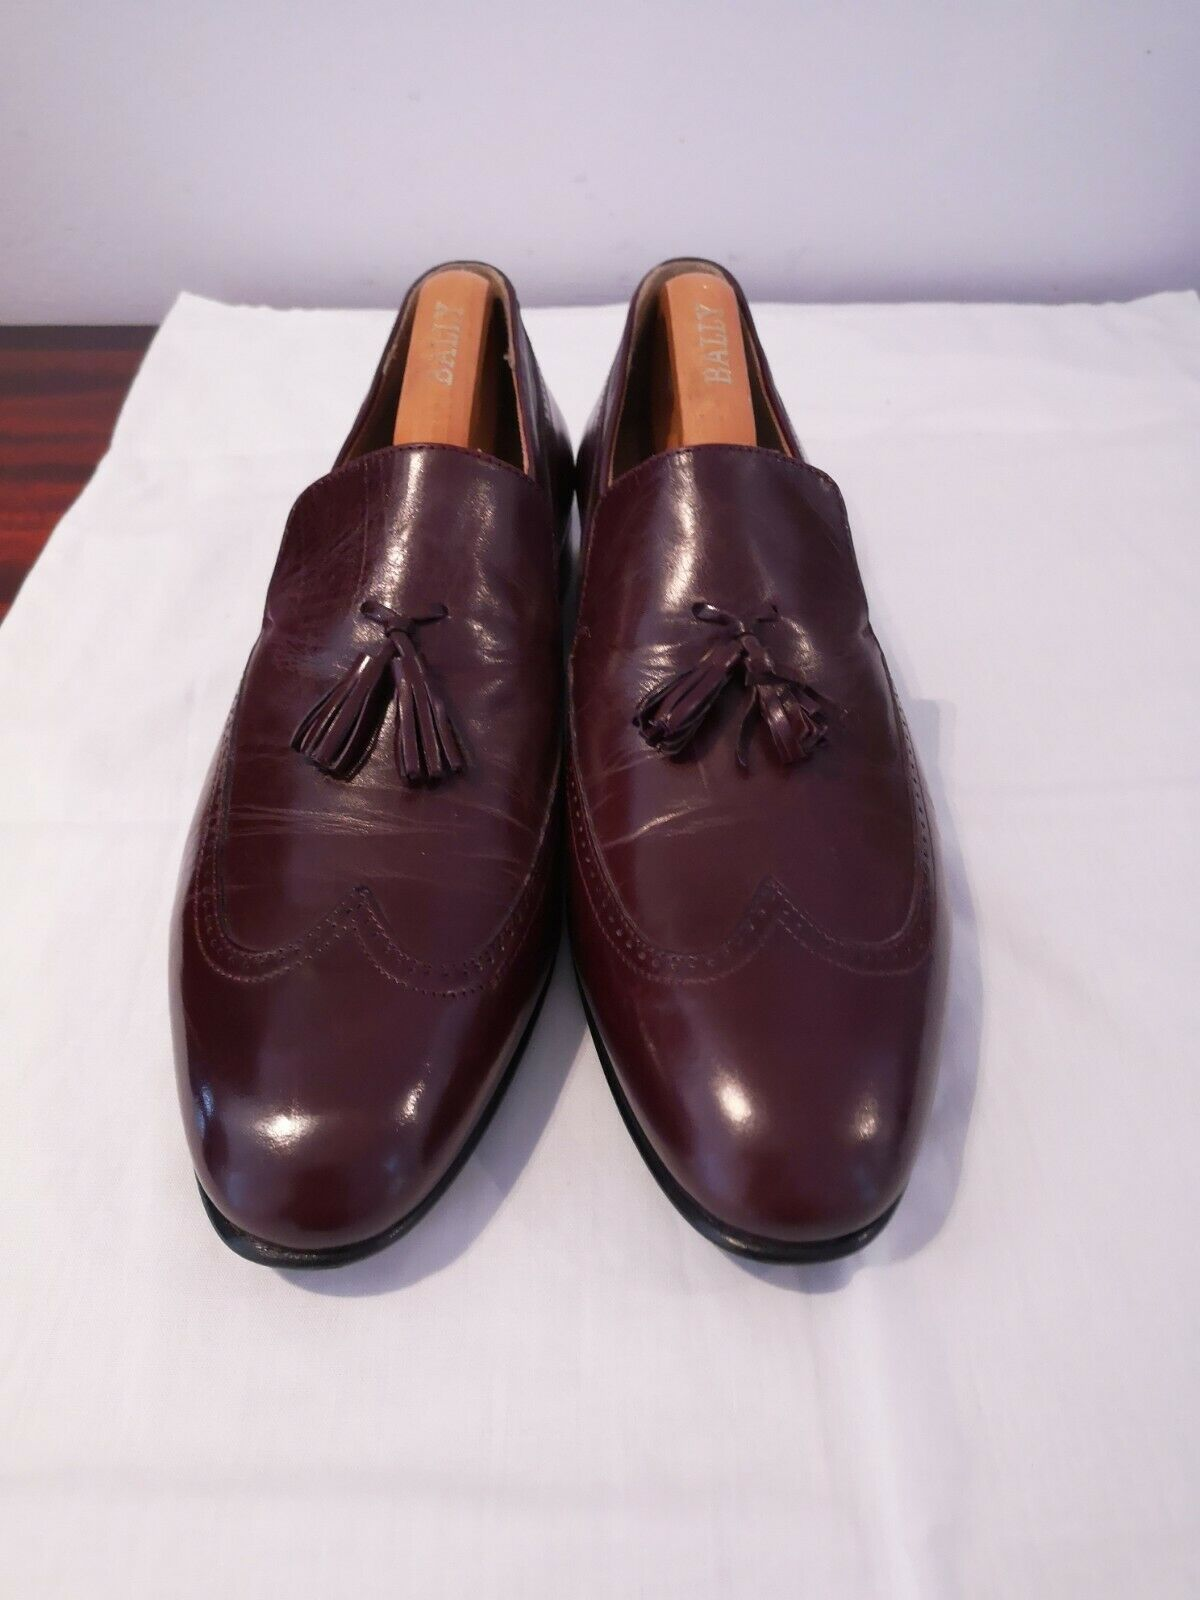 Para hombres de Mocasín Zapatos BALLY rojizo con borlas. Ajuste Estrecho.